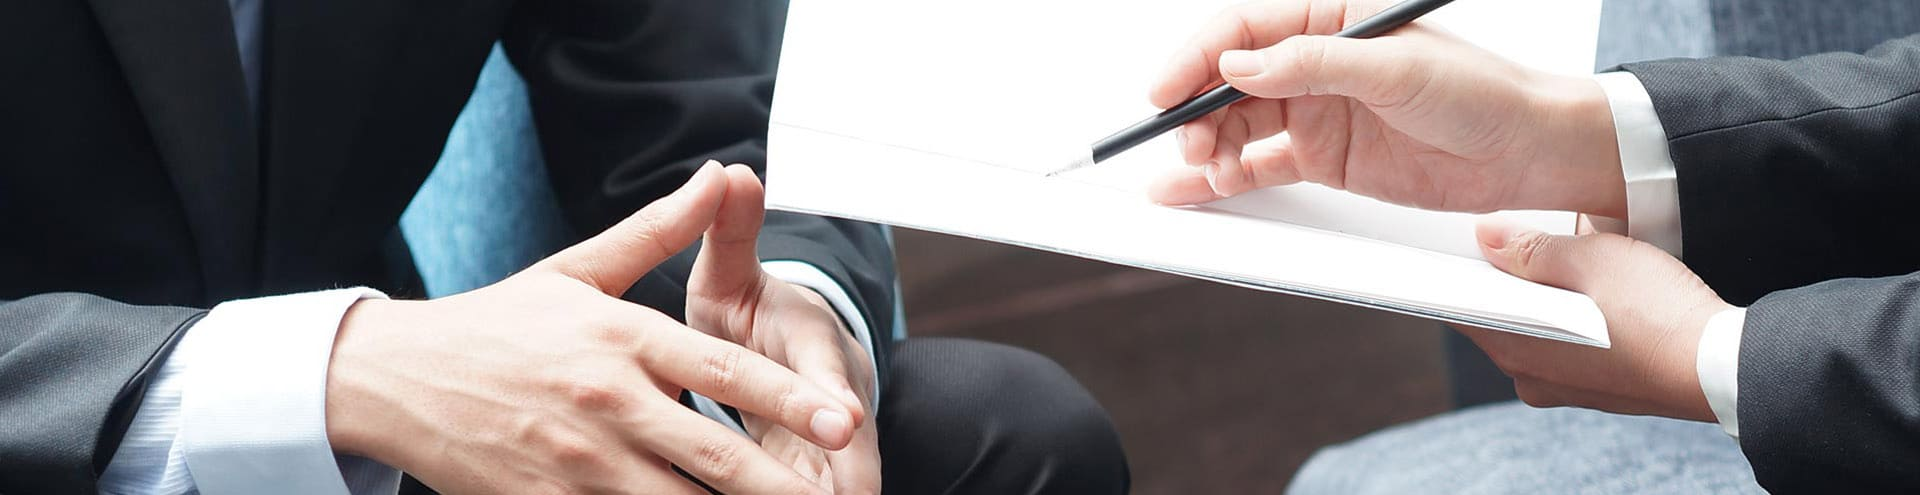 гарантии оказания юридических услуг в Астрахани